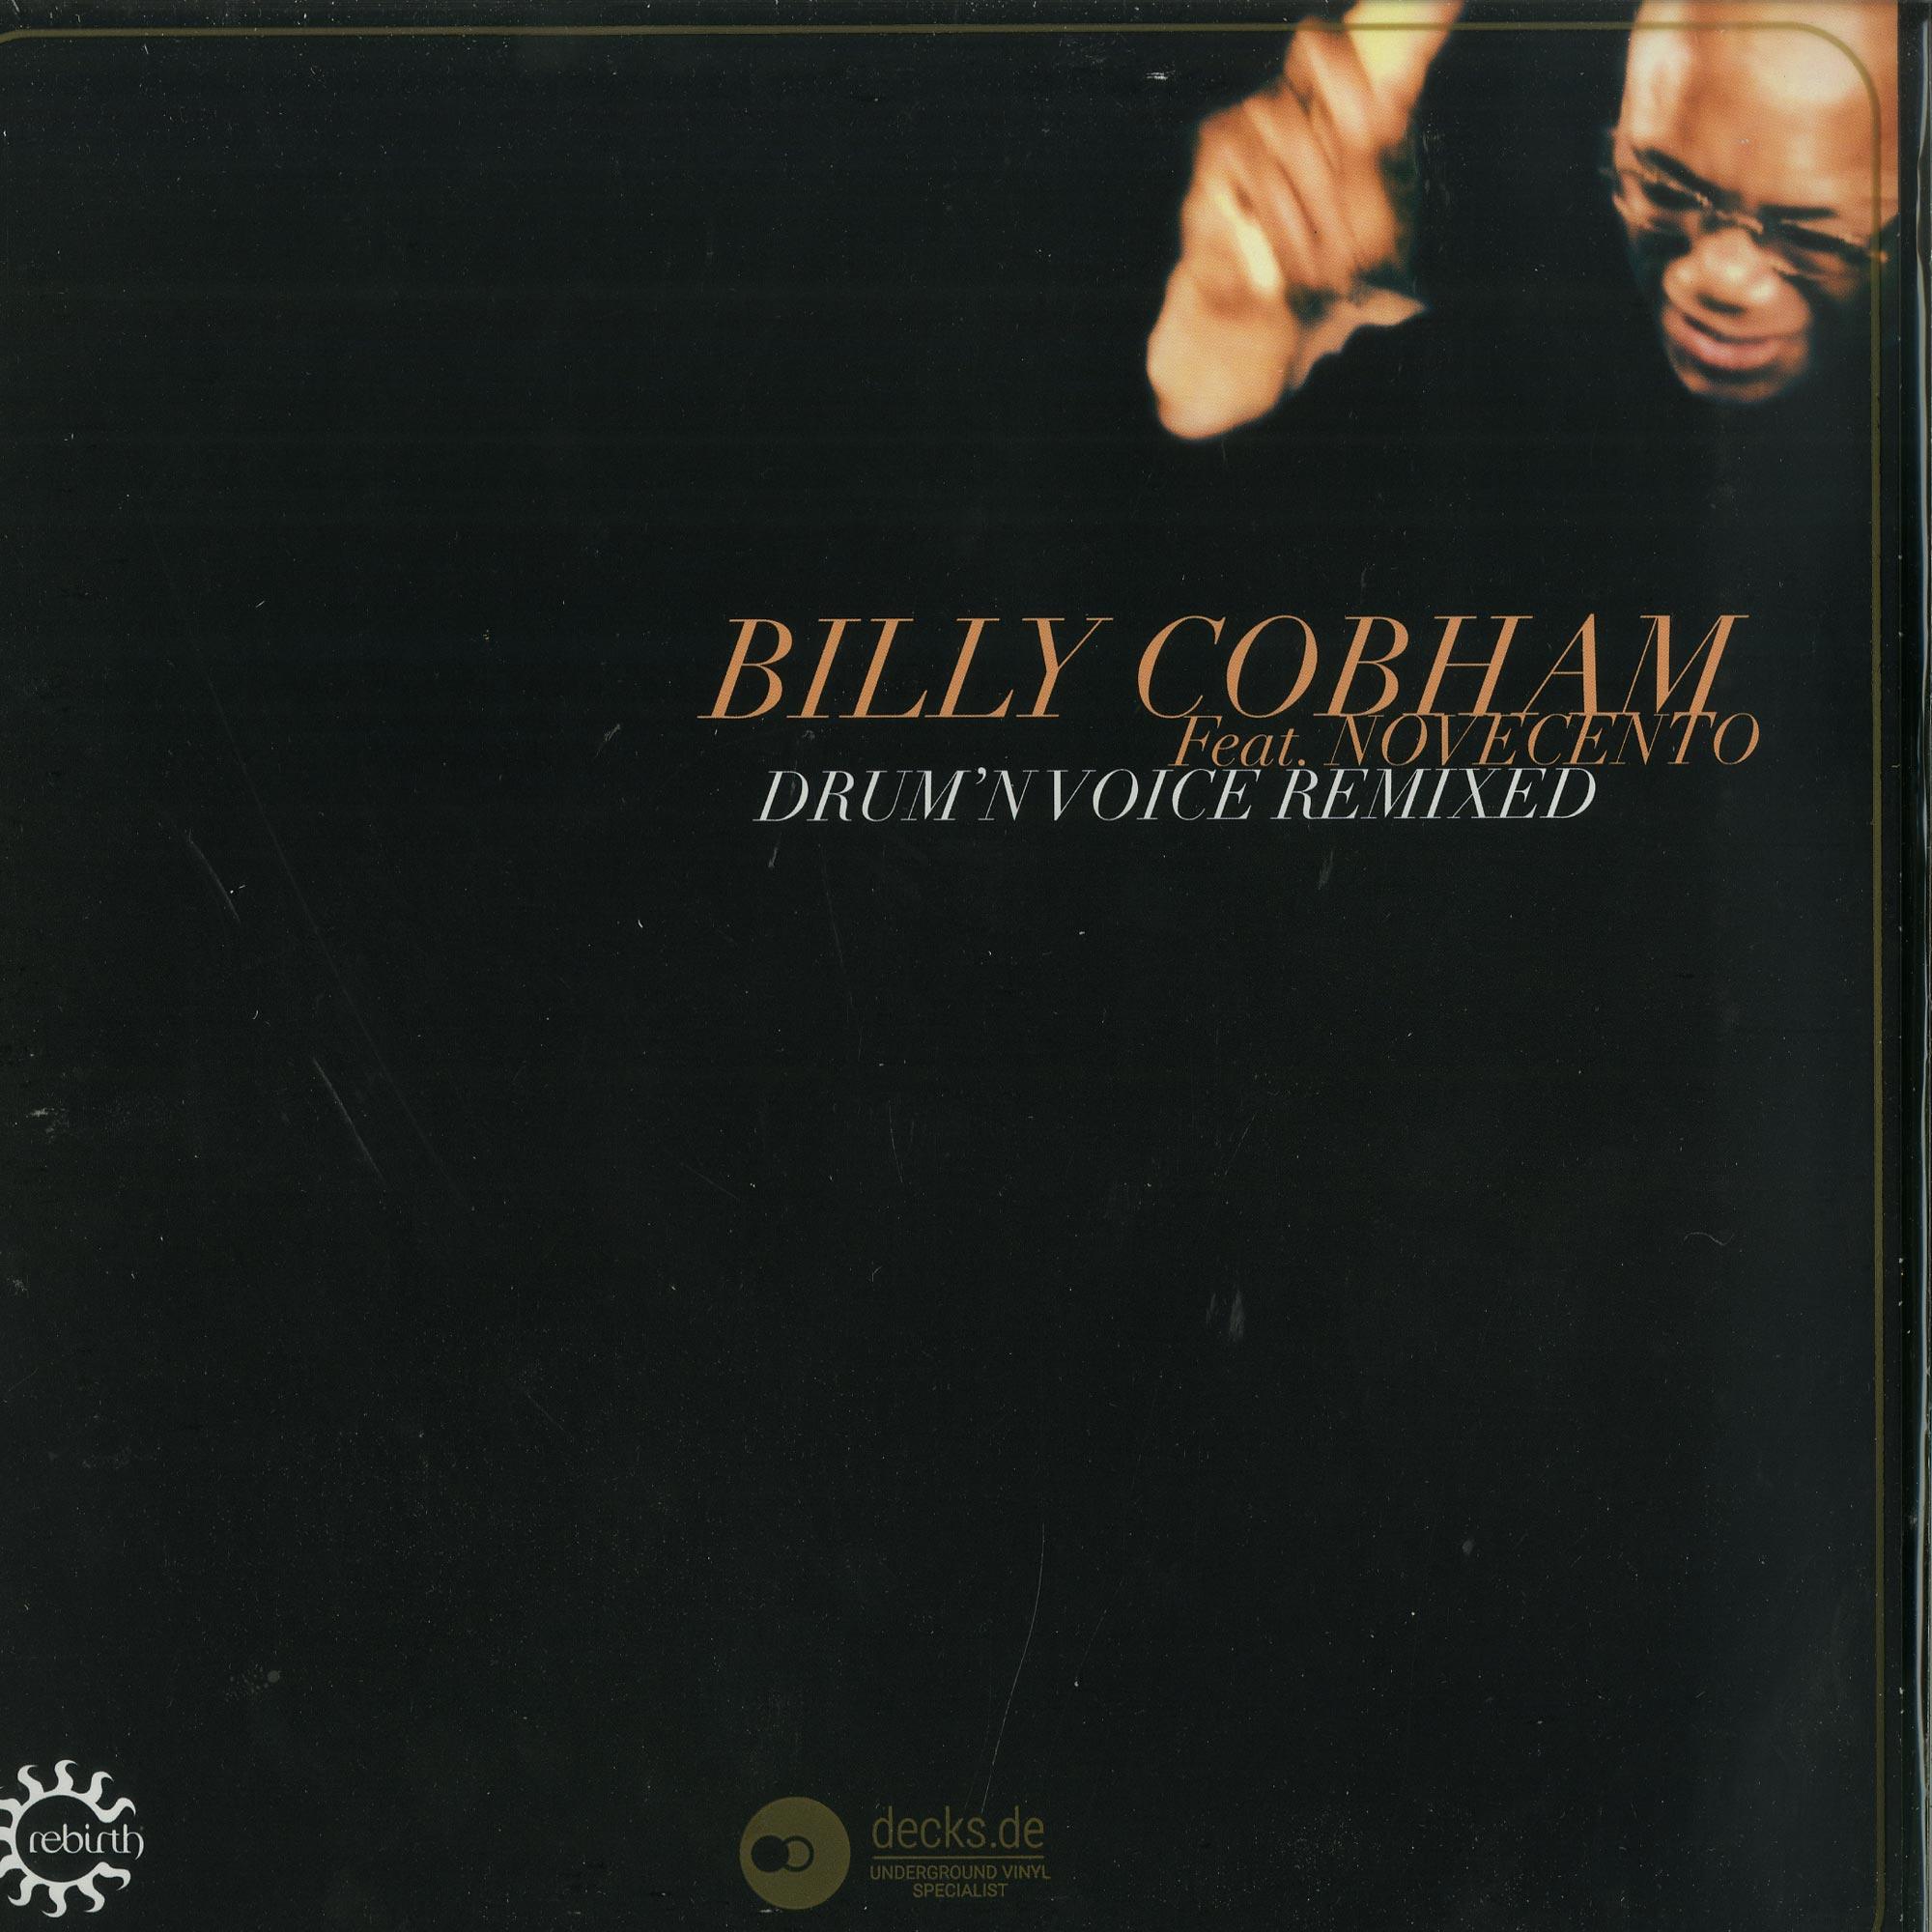 Billy Cobham Feat. Novecento - DRUMN VOICE REMIXED